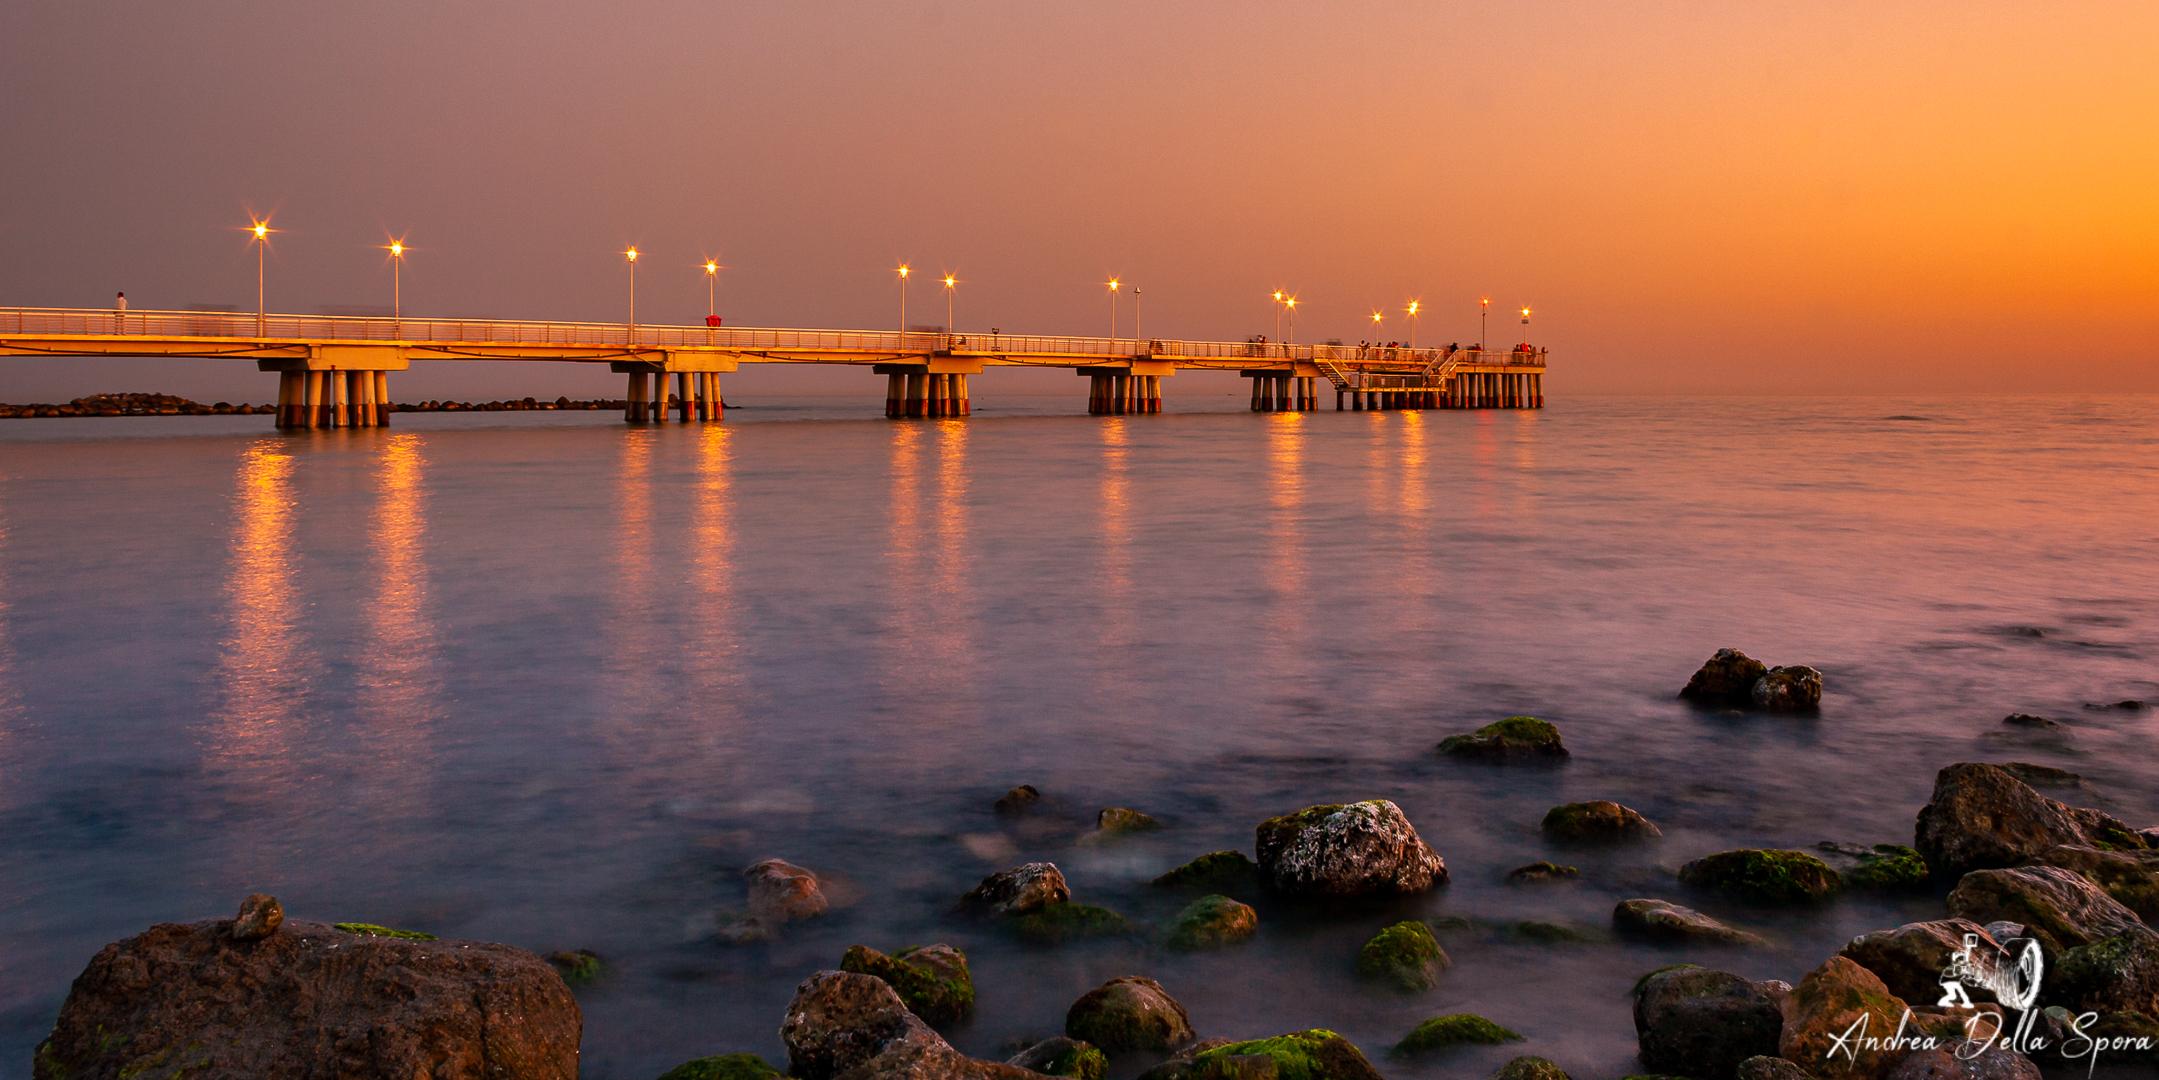 tramonto-mare-pontile-massa